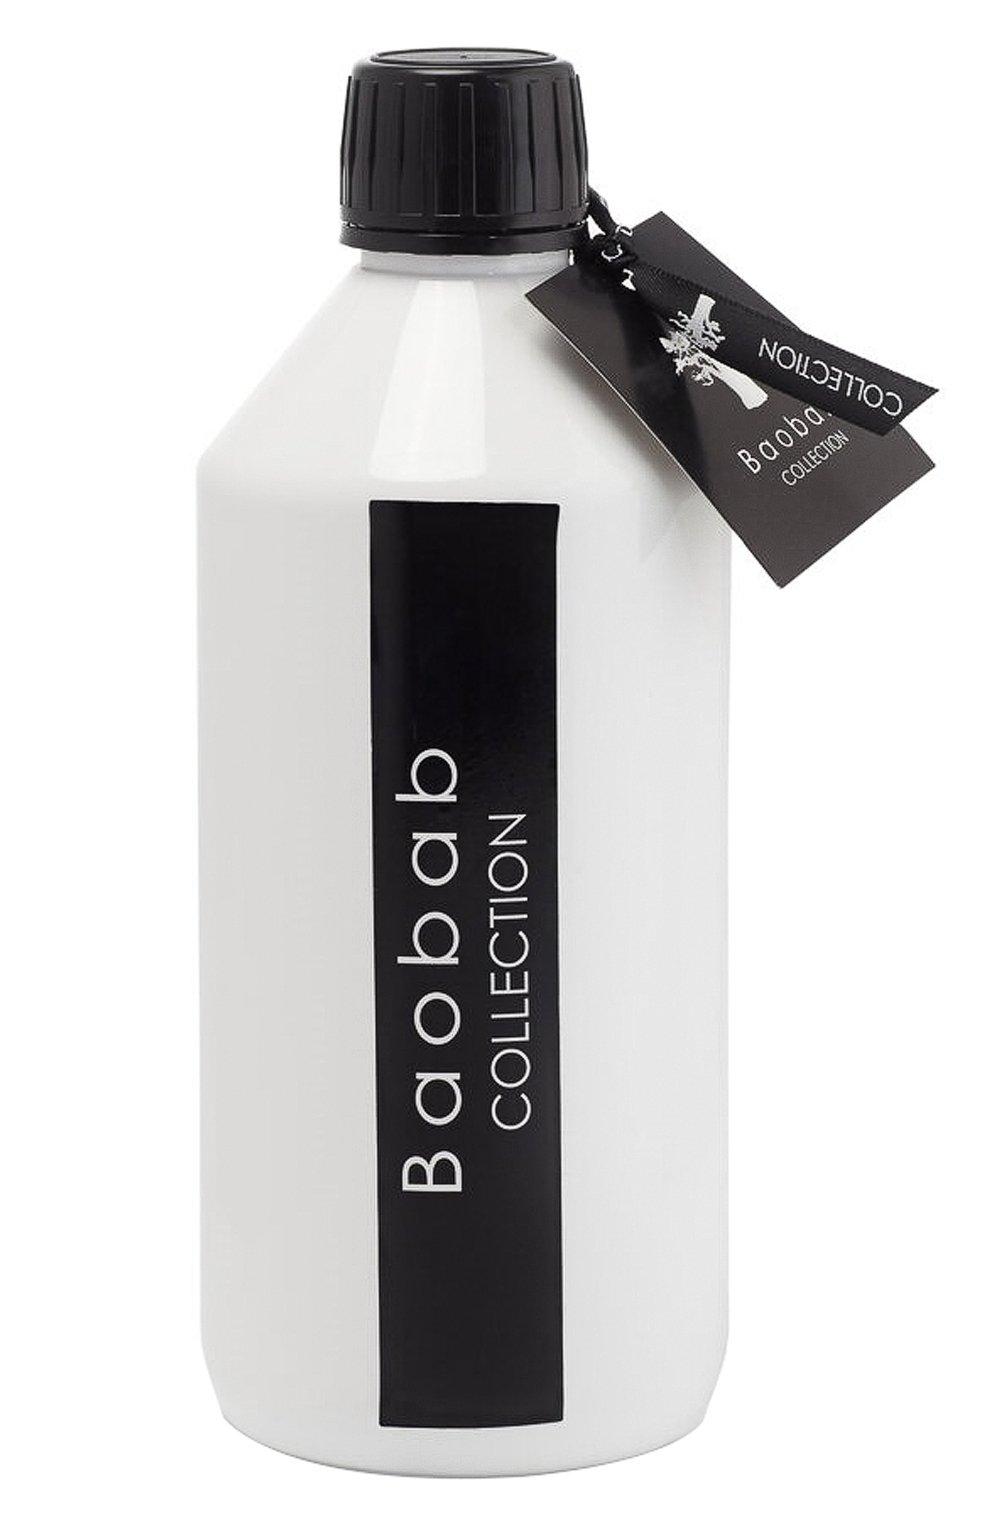 Рефилл pearls white pearls белый мускус-жасмин BAOBAB бесцветного цвета, арт. 5415198274242 | Фото 1 (Ограничения доставки: flammable)